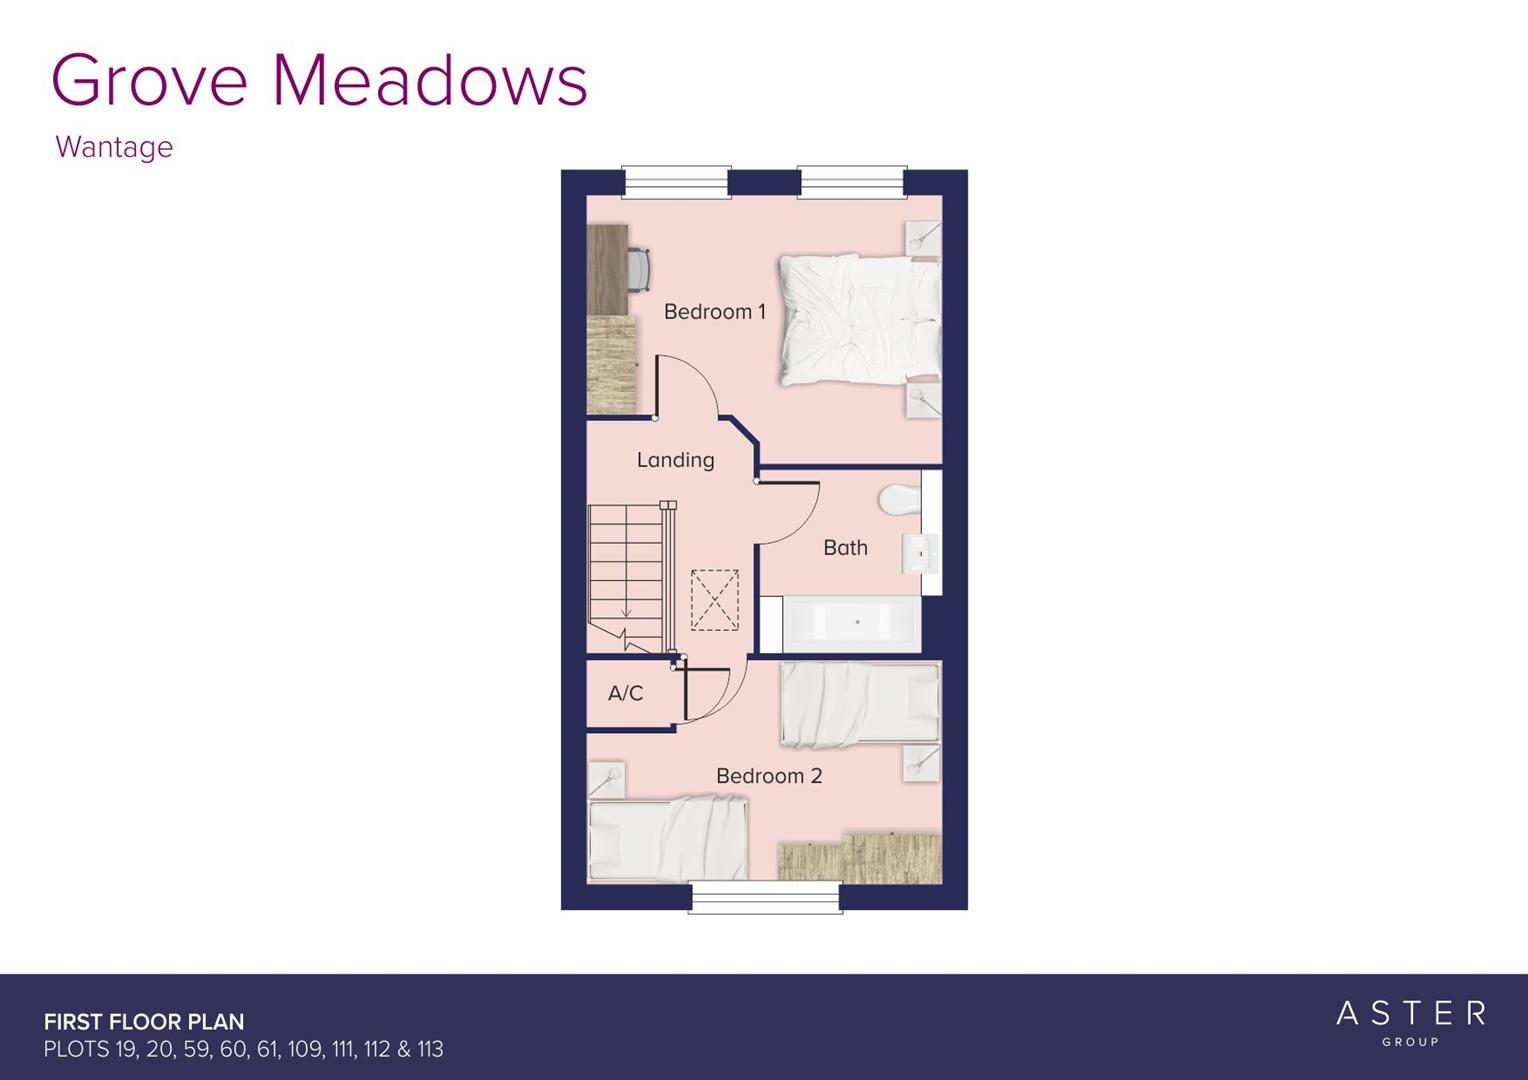 Grove Meadows Wantage_Plots 19 20 59 60 61 109 111